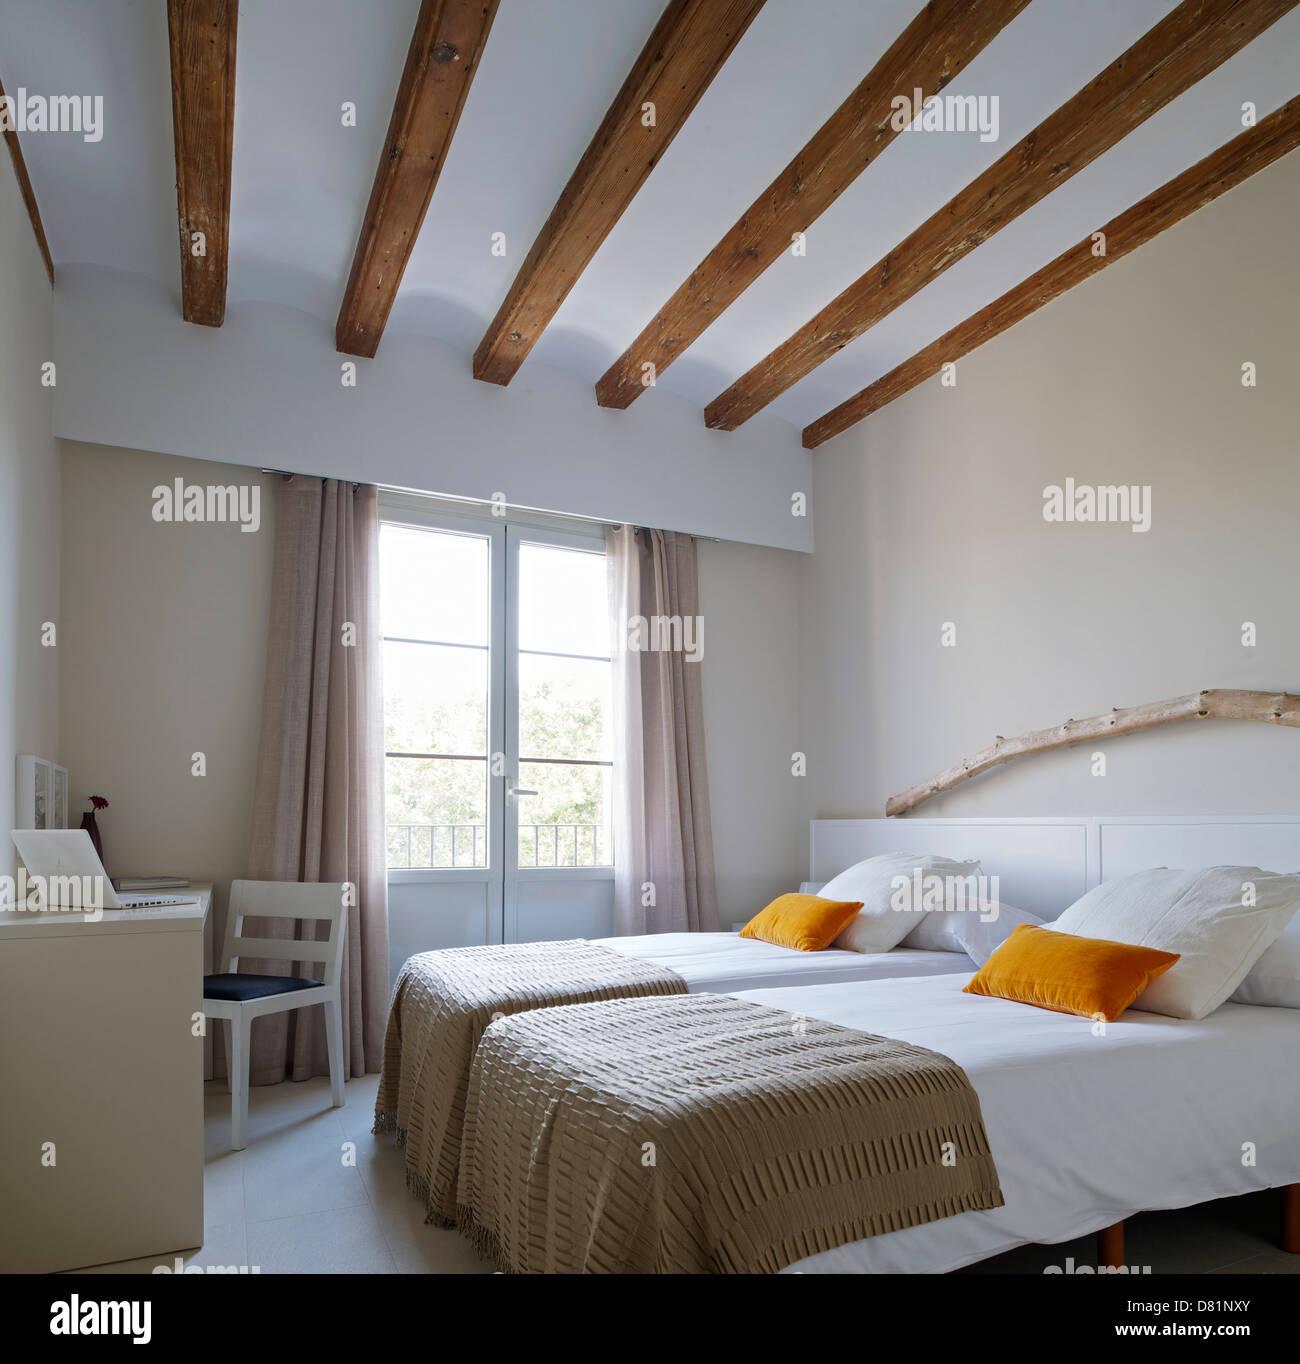 apartments in barcelona, barcelona, spain. architect: laba stock